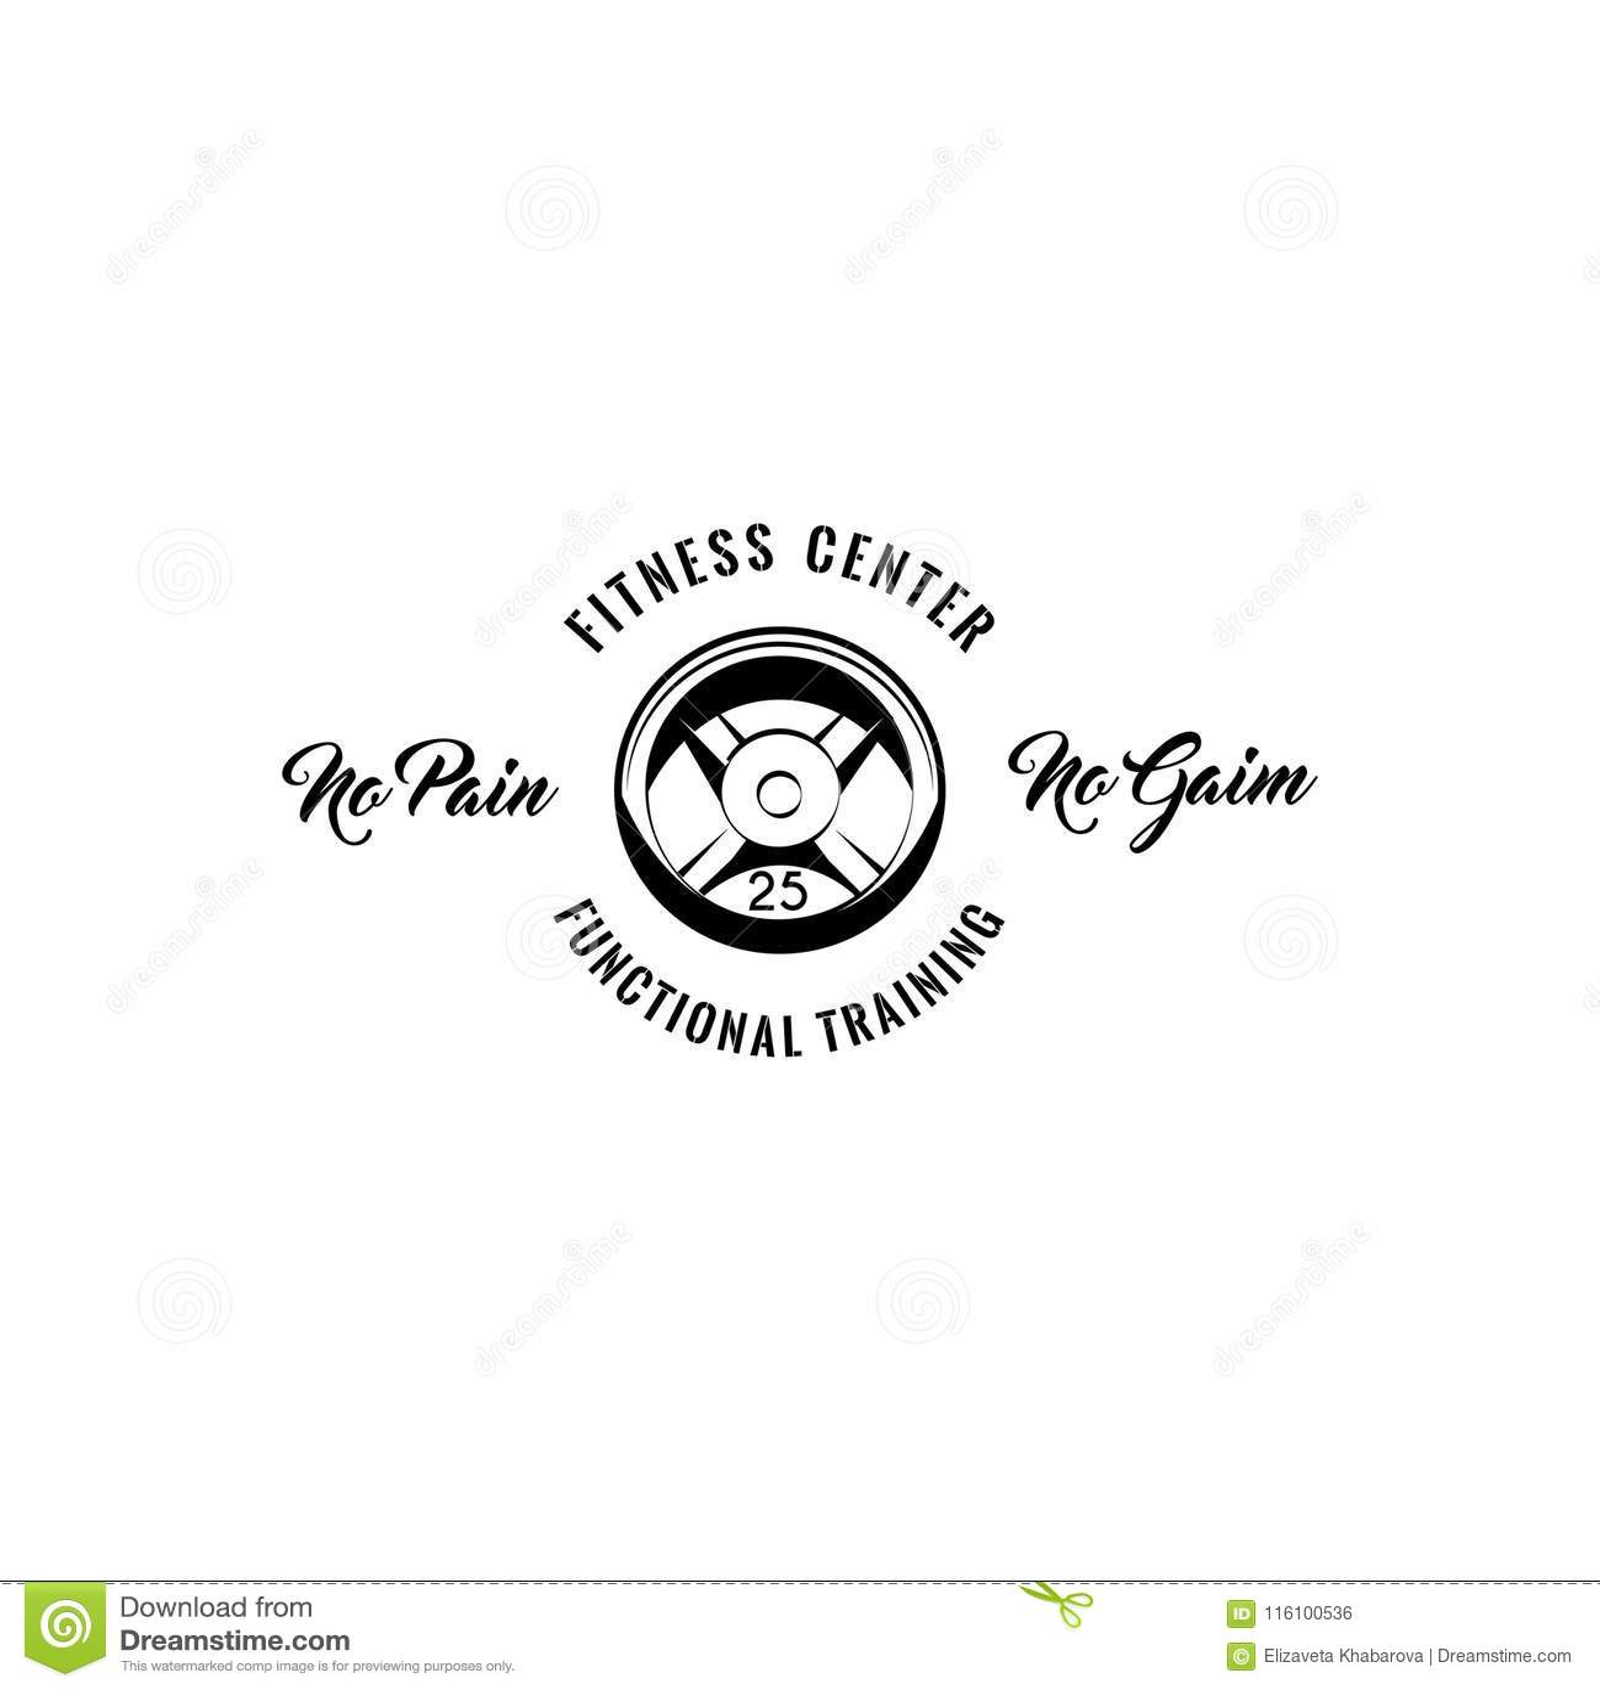 Barbell disk. Sport equipment. Fitness center logo emblem badge. No Pain No Gain inscription. Functional training. Vector.